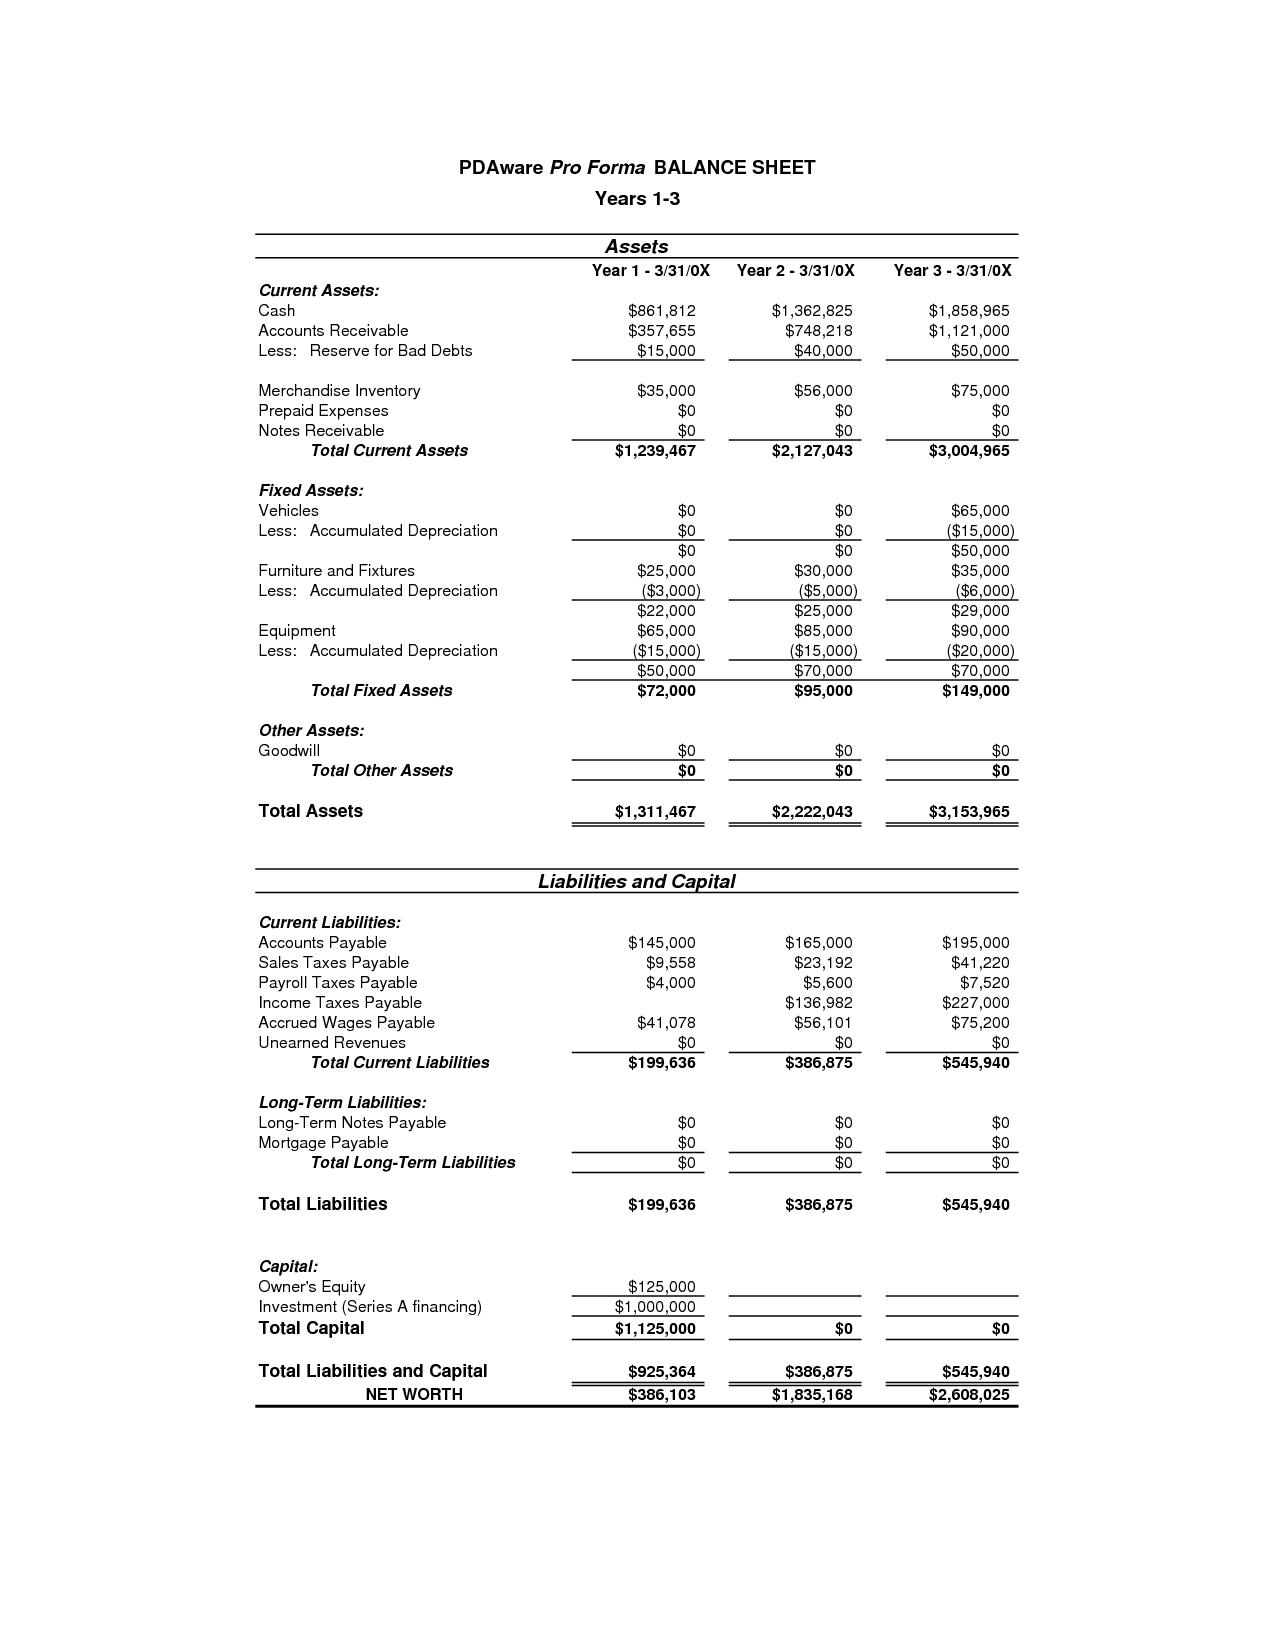 Pro Forma Financial Statements Template - Best Template Collection for Pro Forma Income Statement Generator